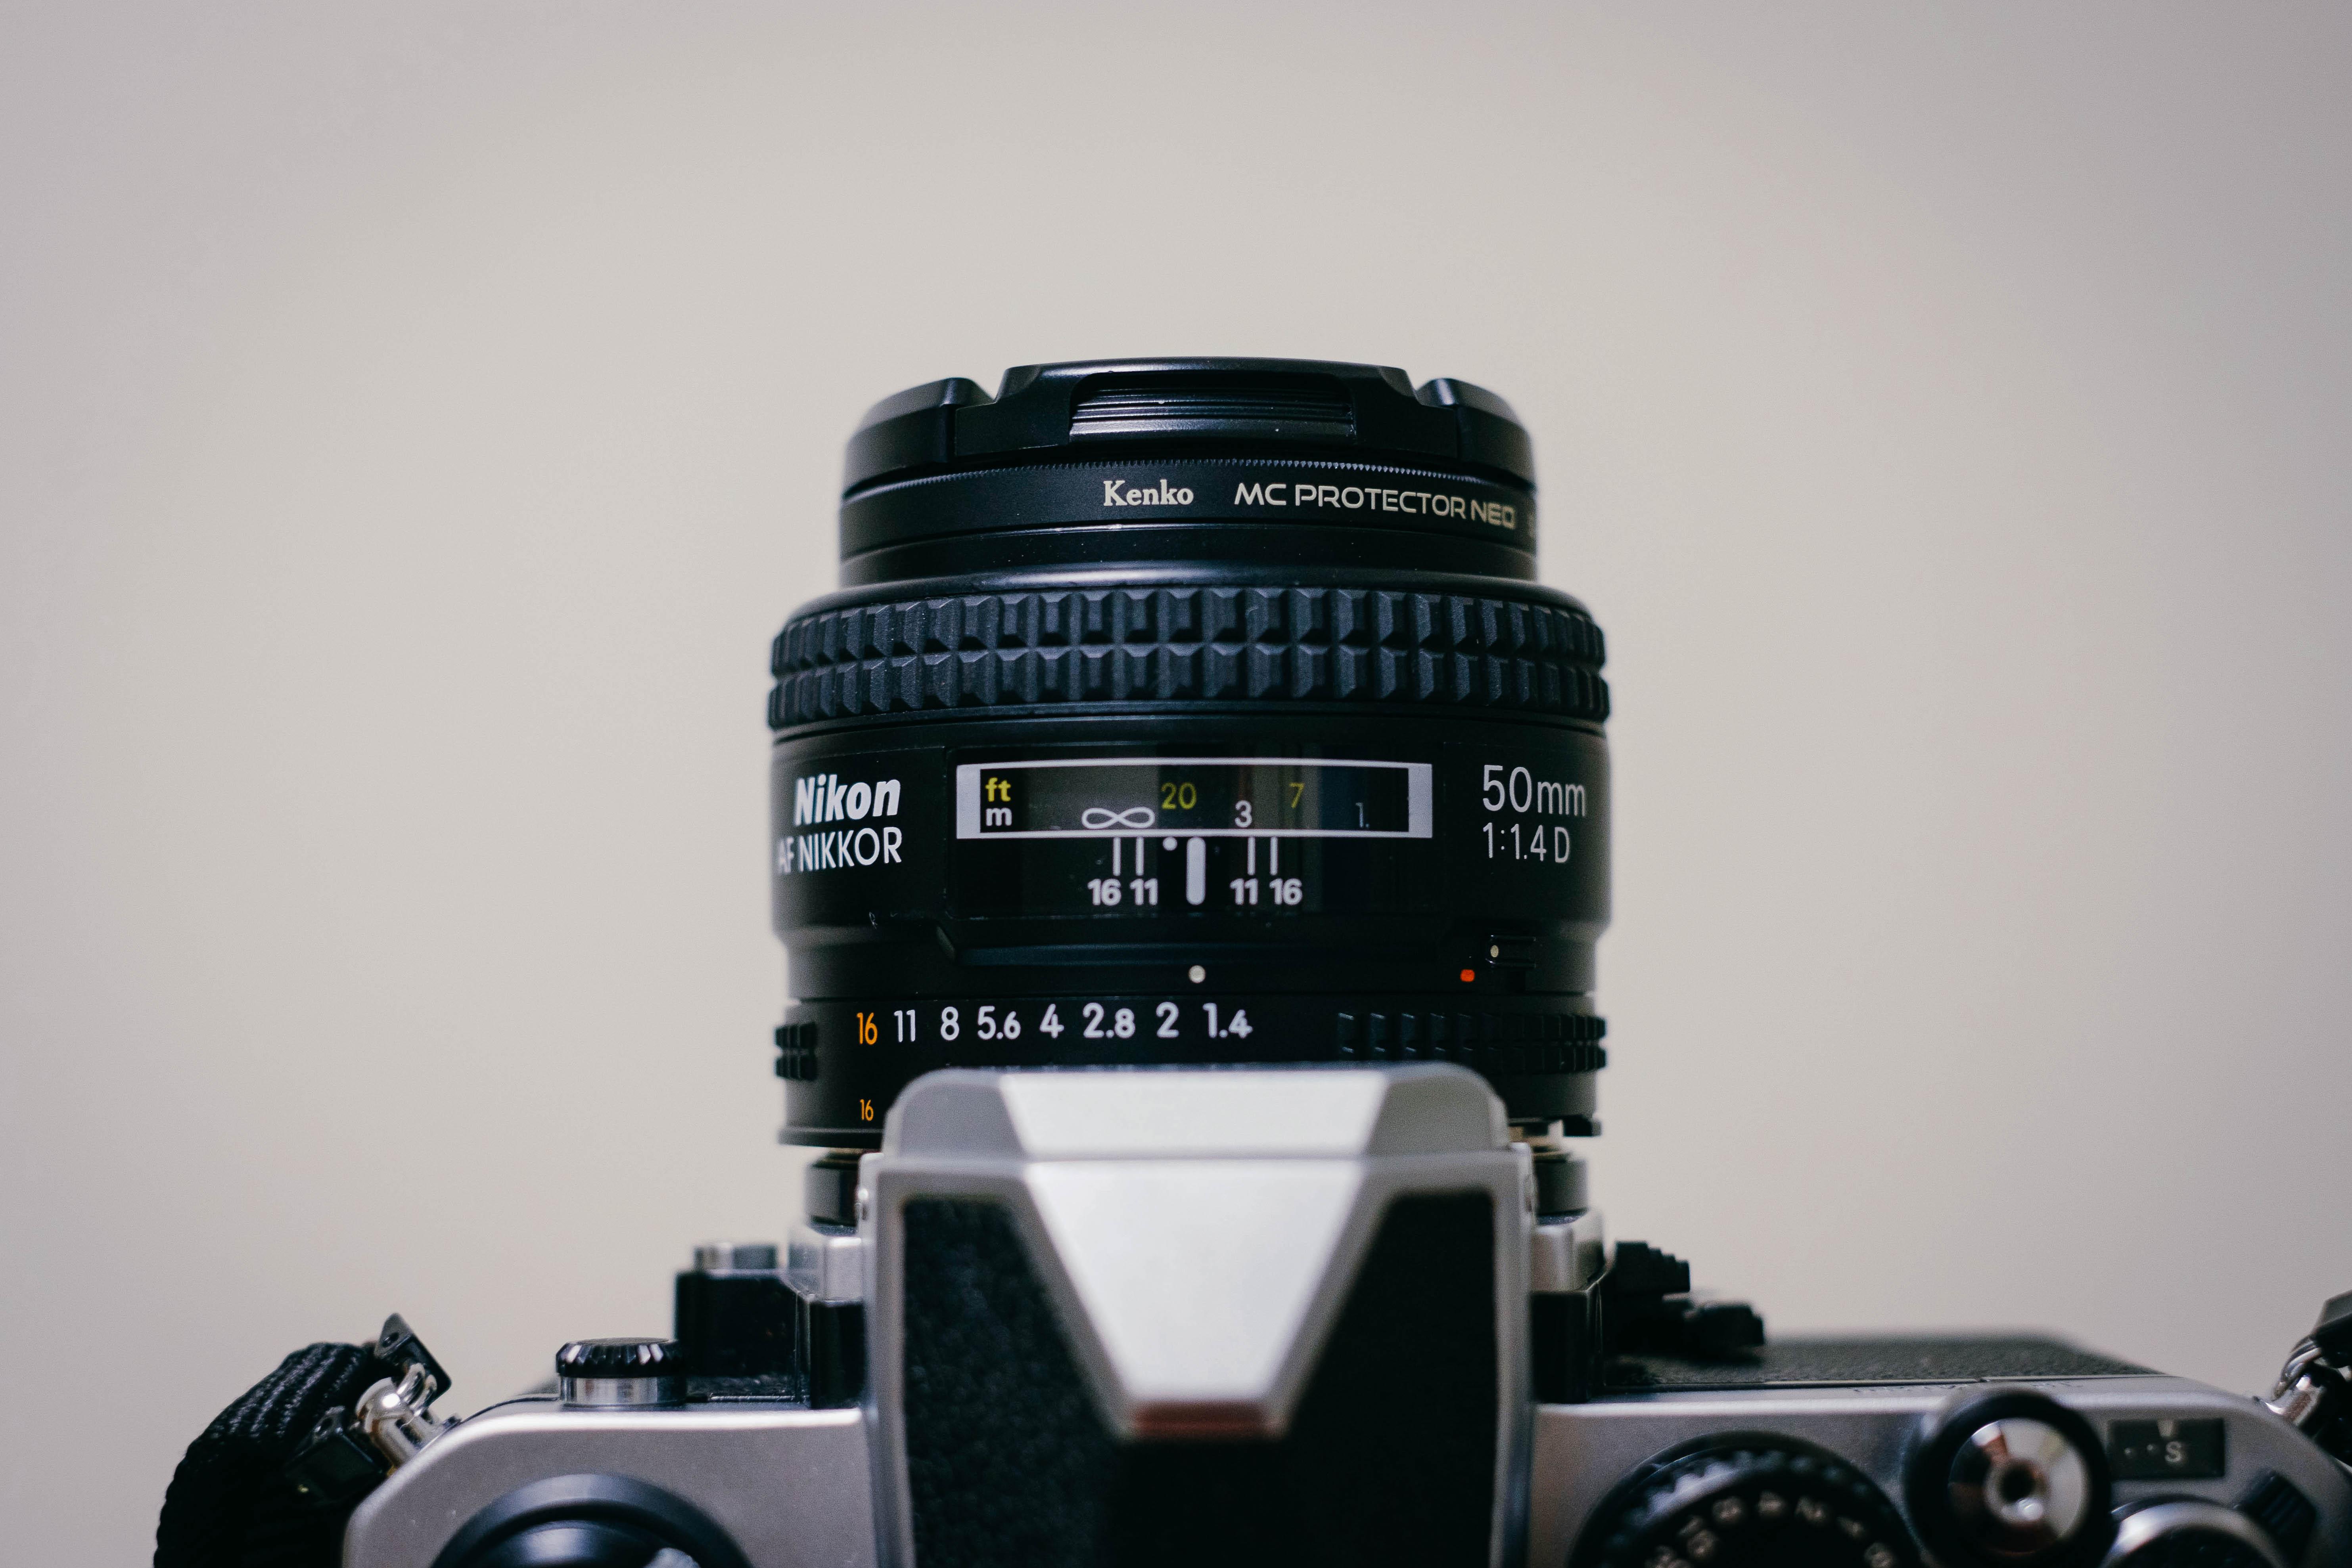 Nikon newfm